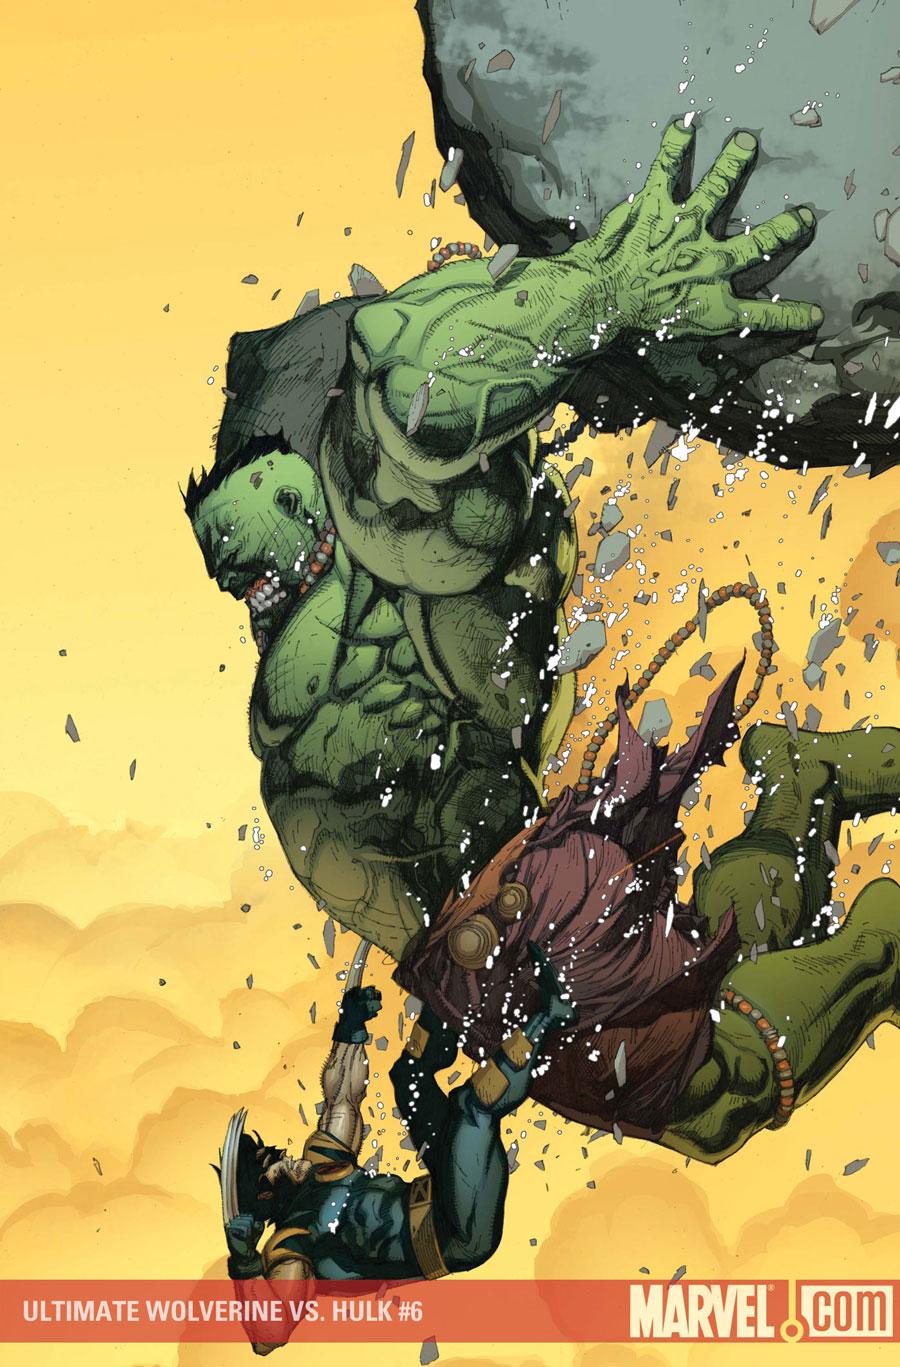 Leinil-Yu-comic-art-gallery-hulk-wolverine